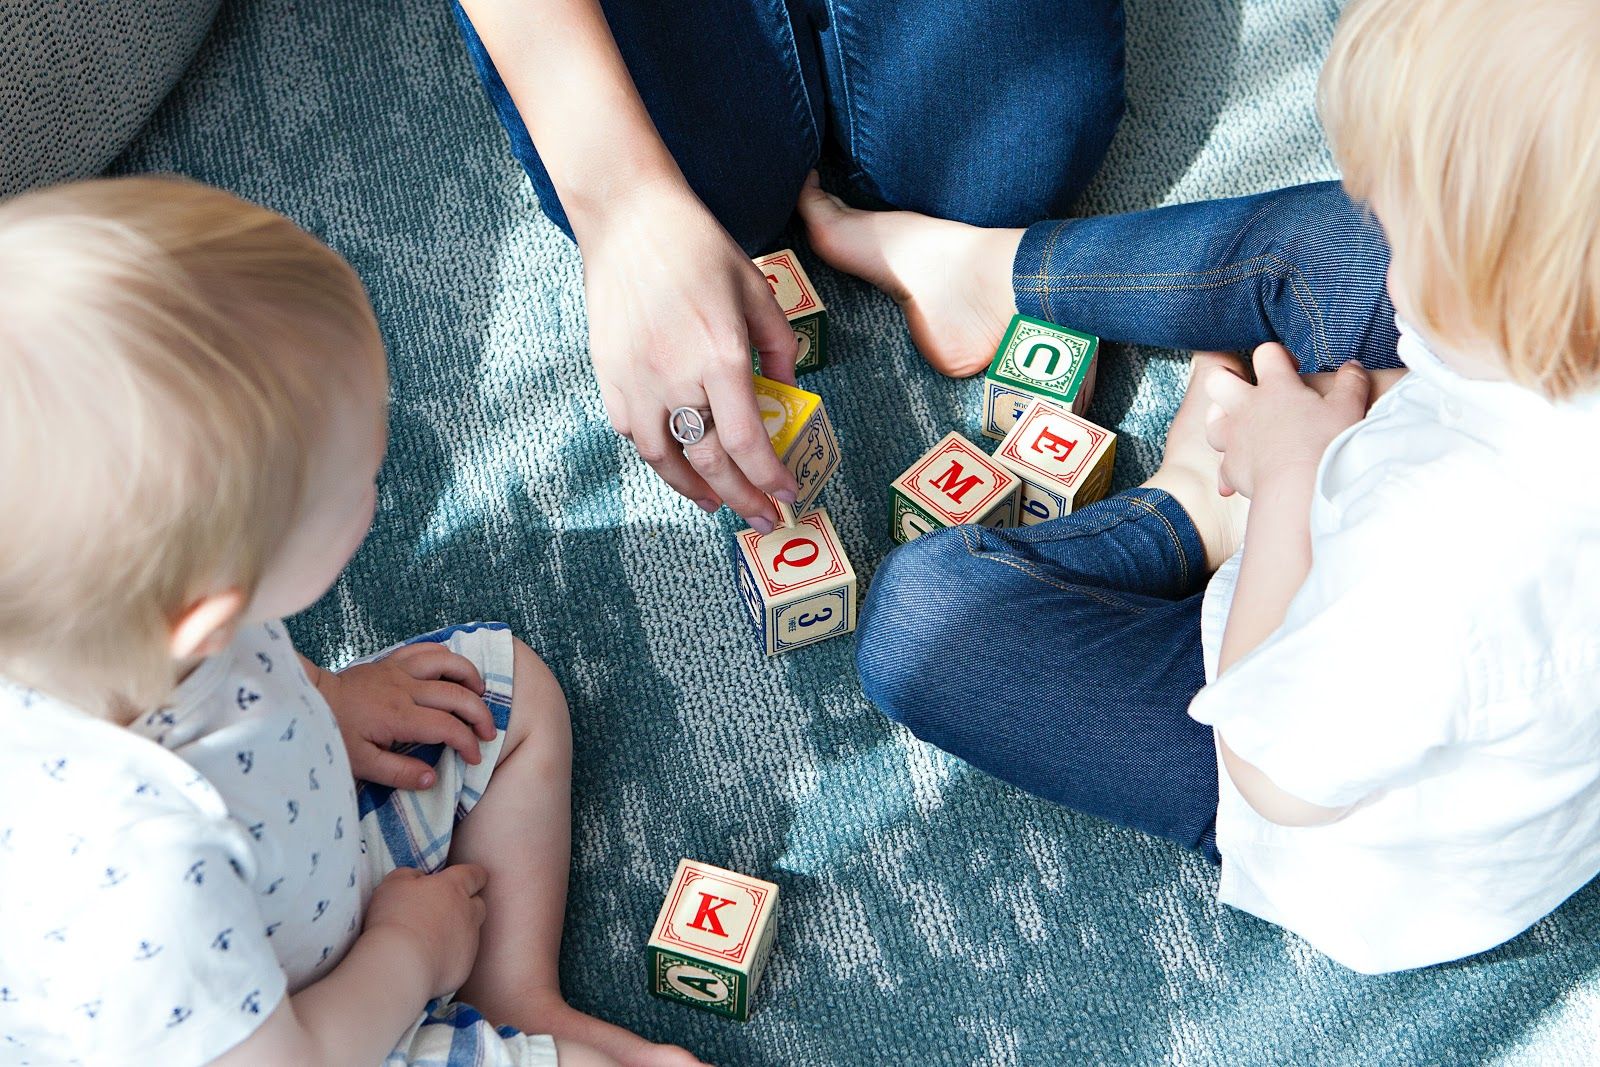 Centria autism services (A guide)